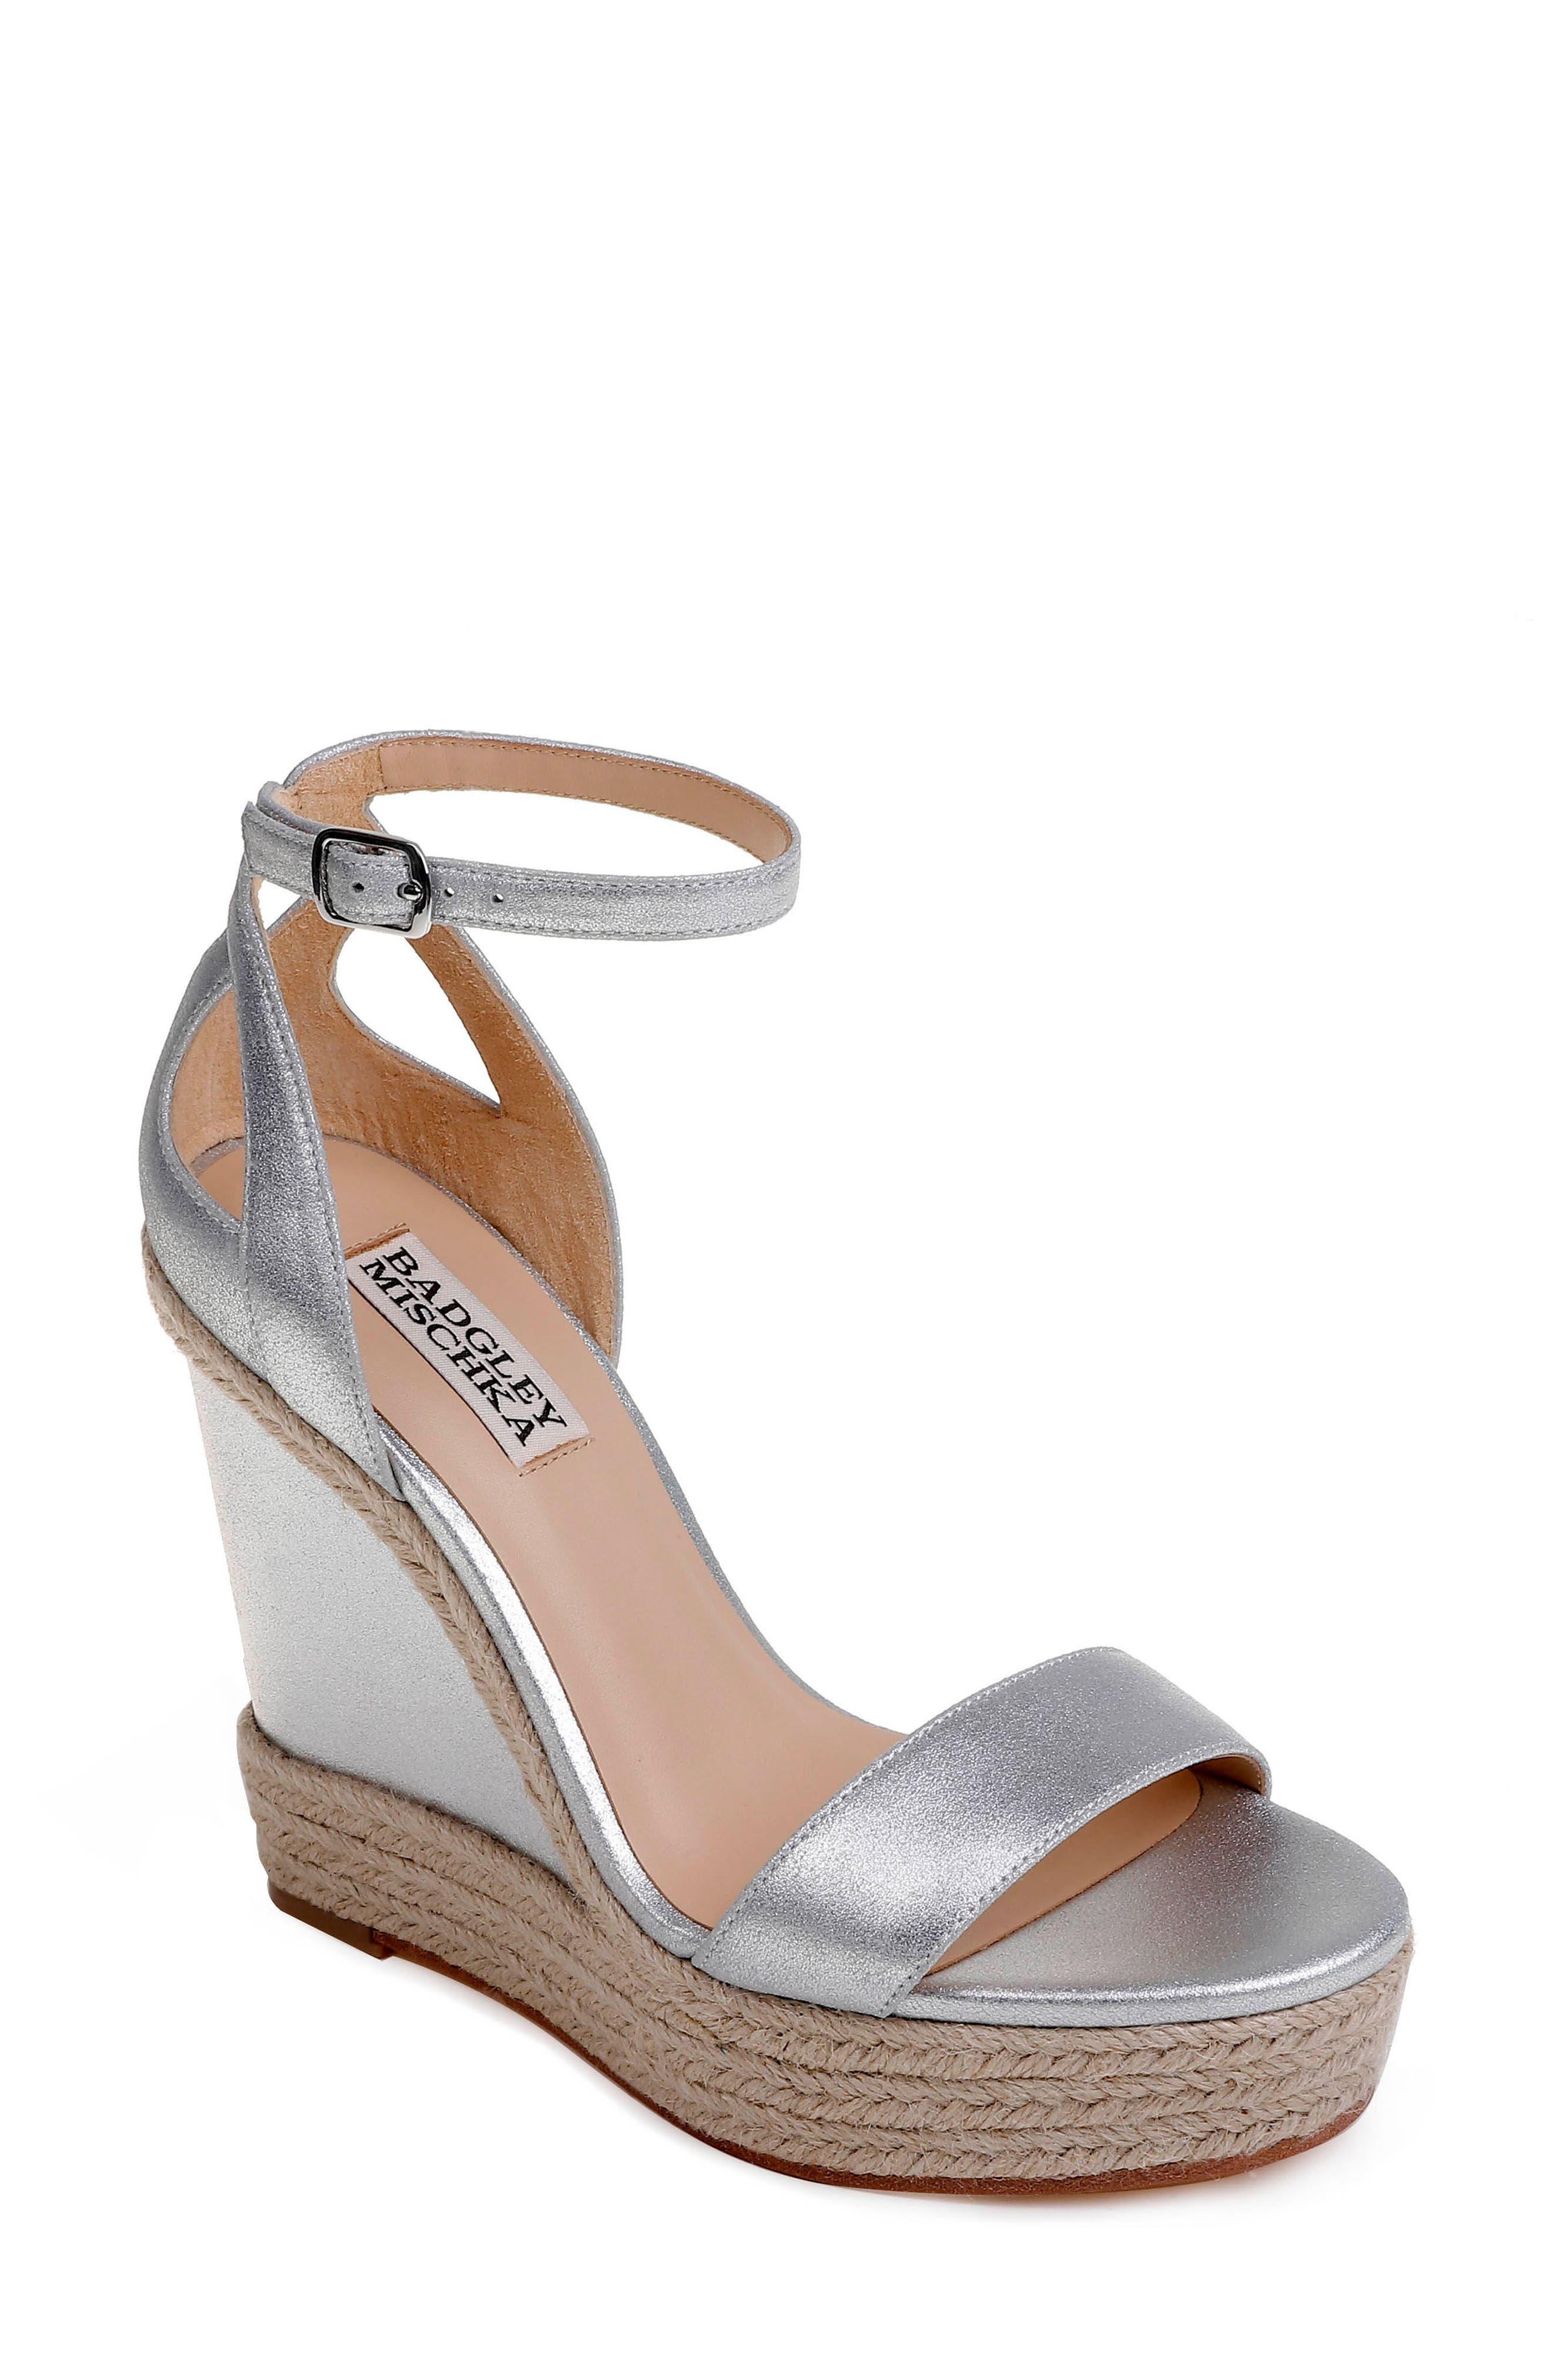 Honest Espadrille Wedge Sandal,                             Main thumbnail 1, color,                             Silver Metallic Suede